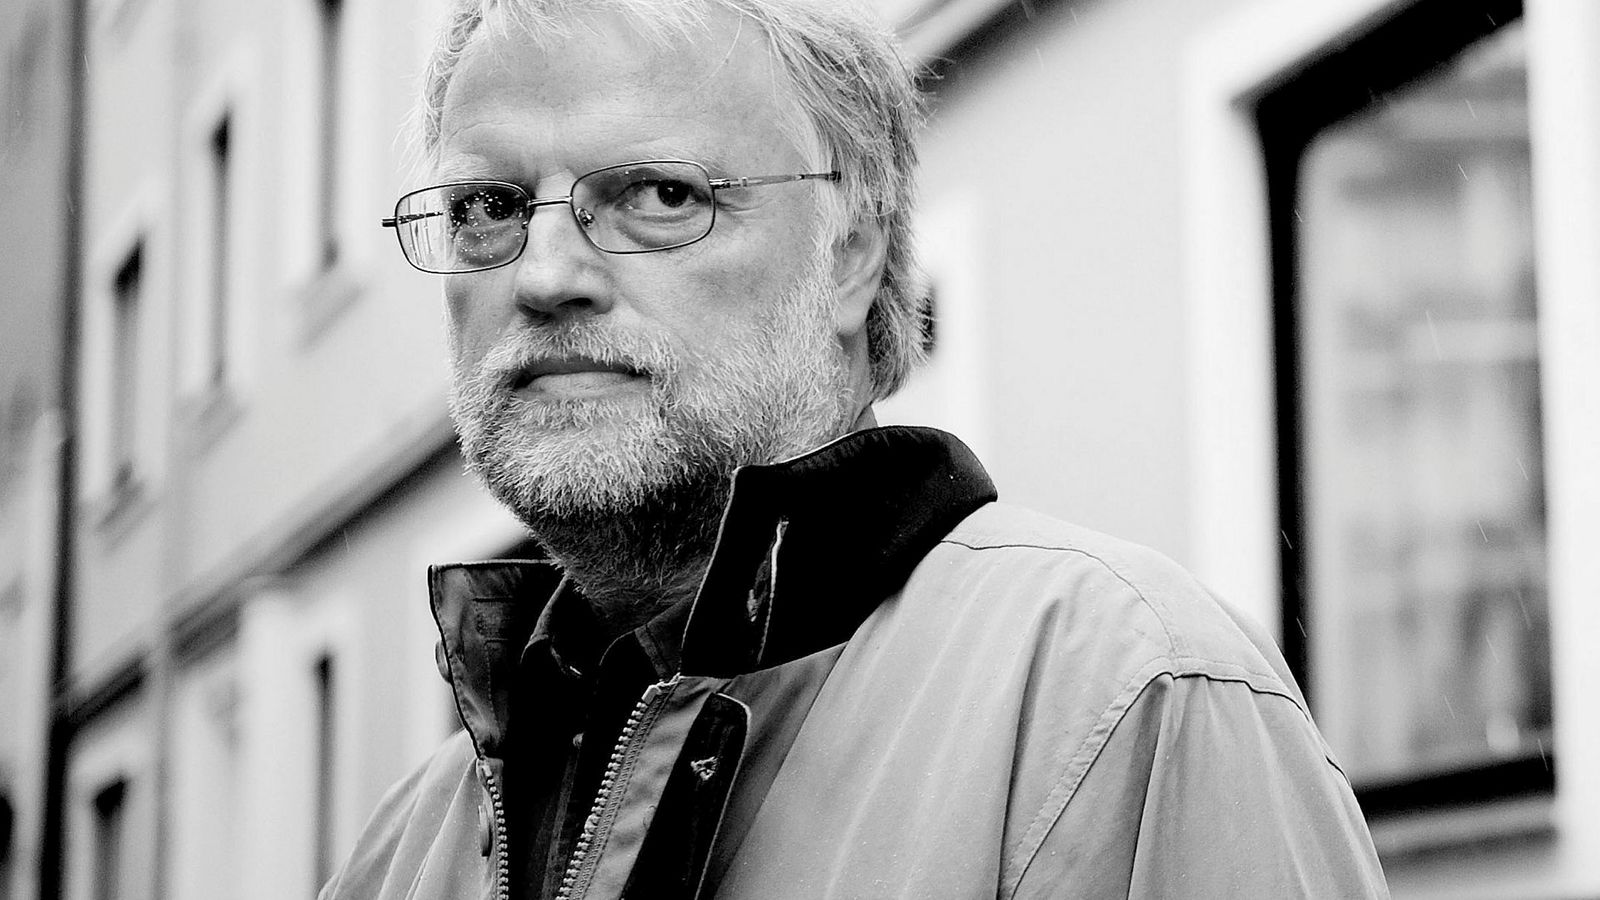 Glenn Ole Hellekjær